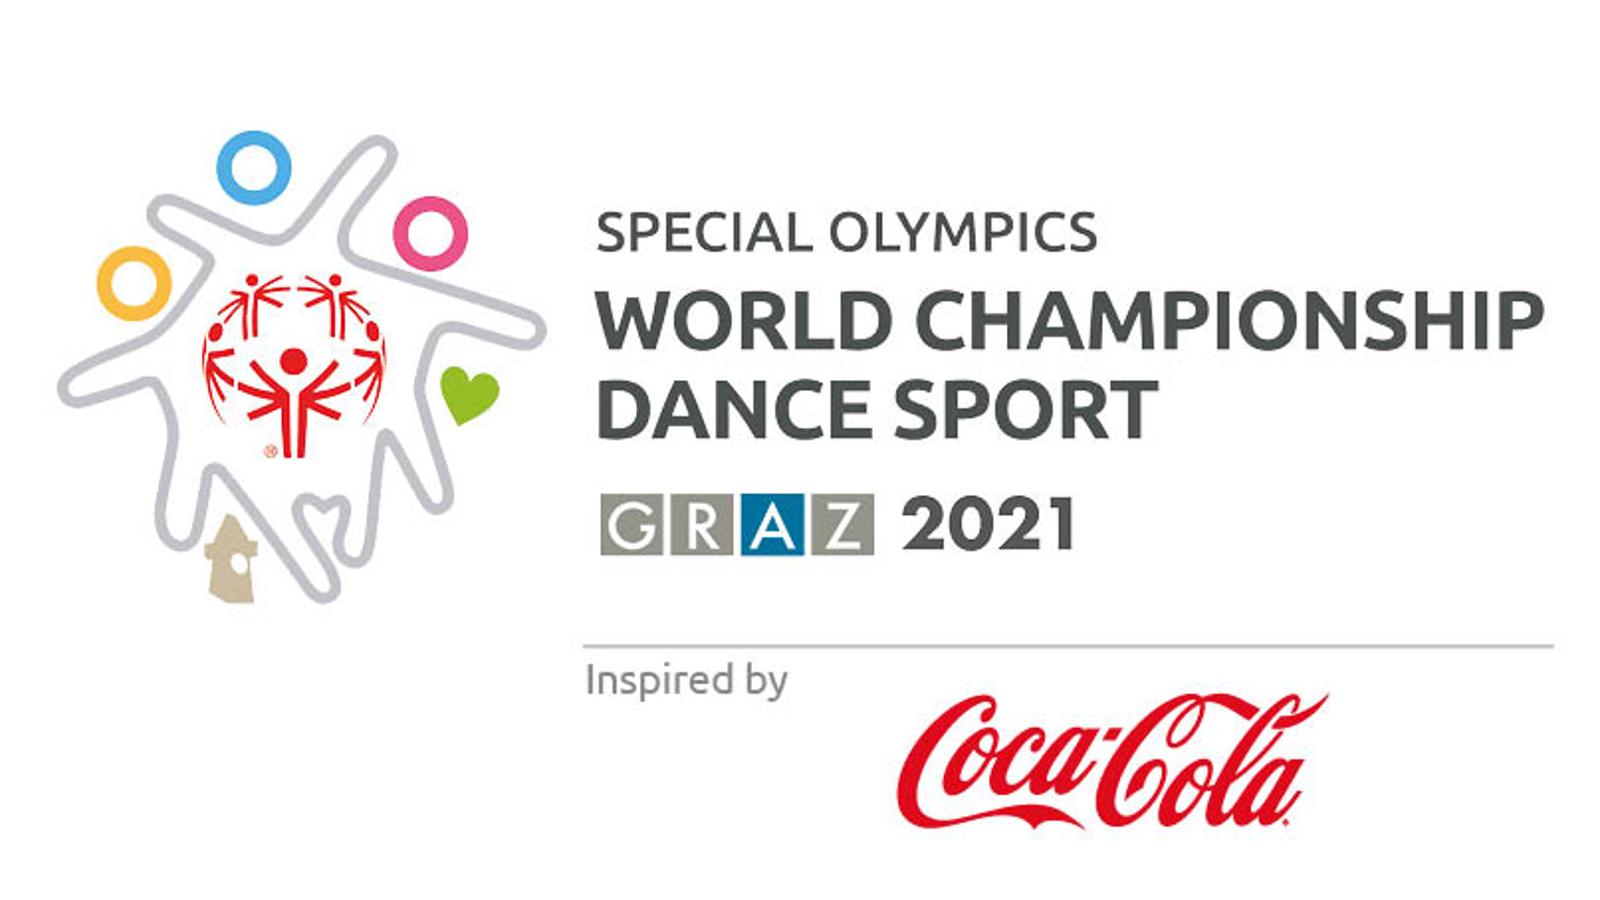 Special Olympics World Championship Dance Sport